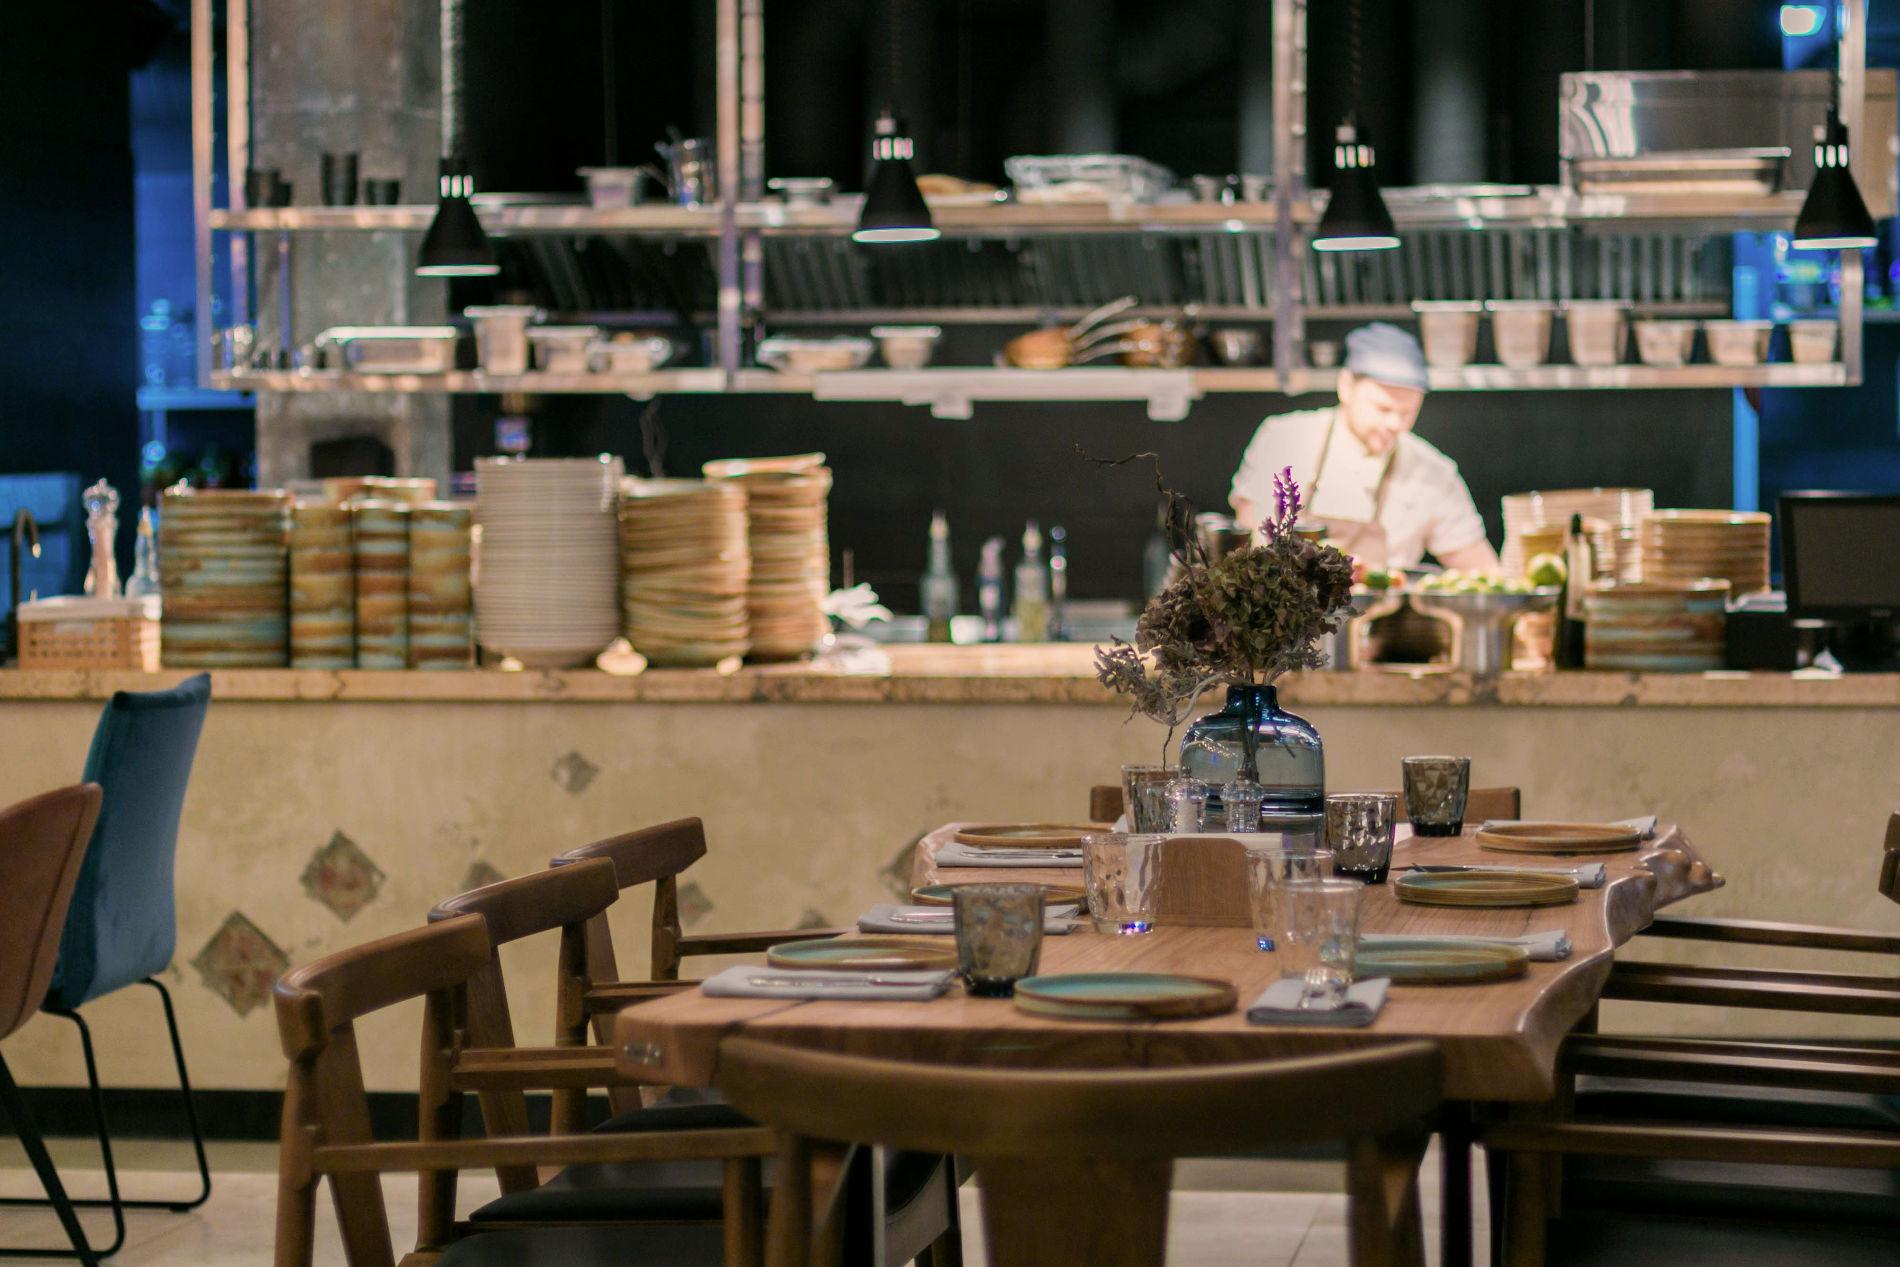 Открытая кухня ресторана «Голый повар» ©Фото ресторана «Голый повар»